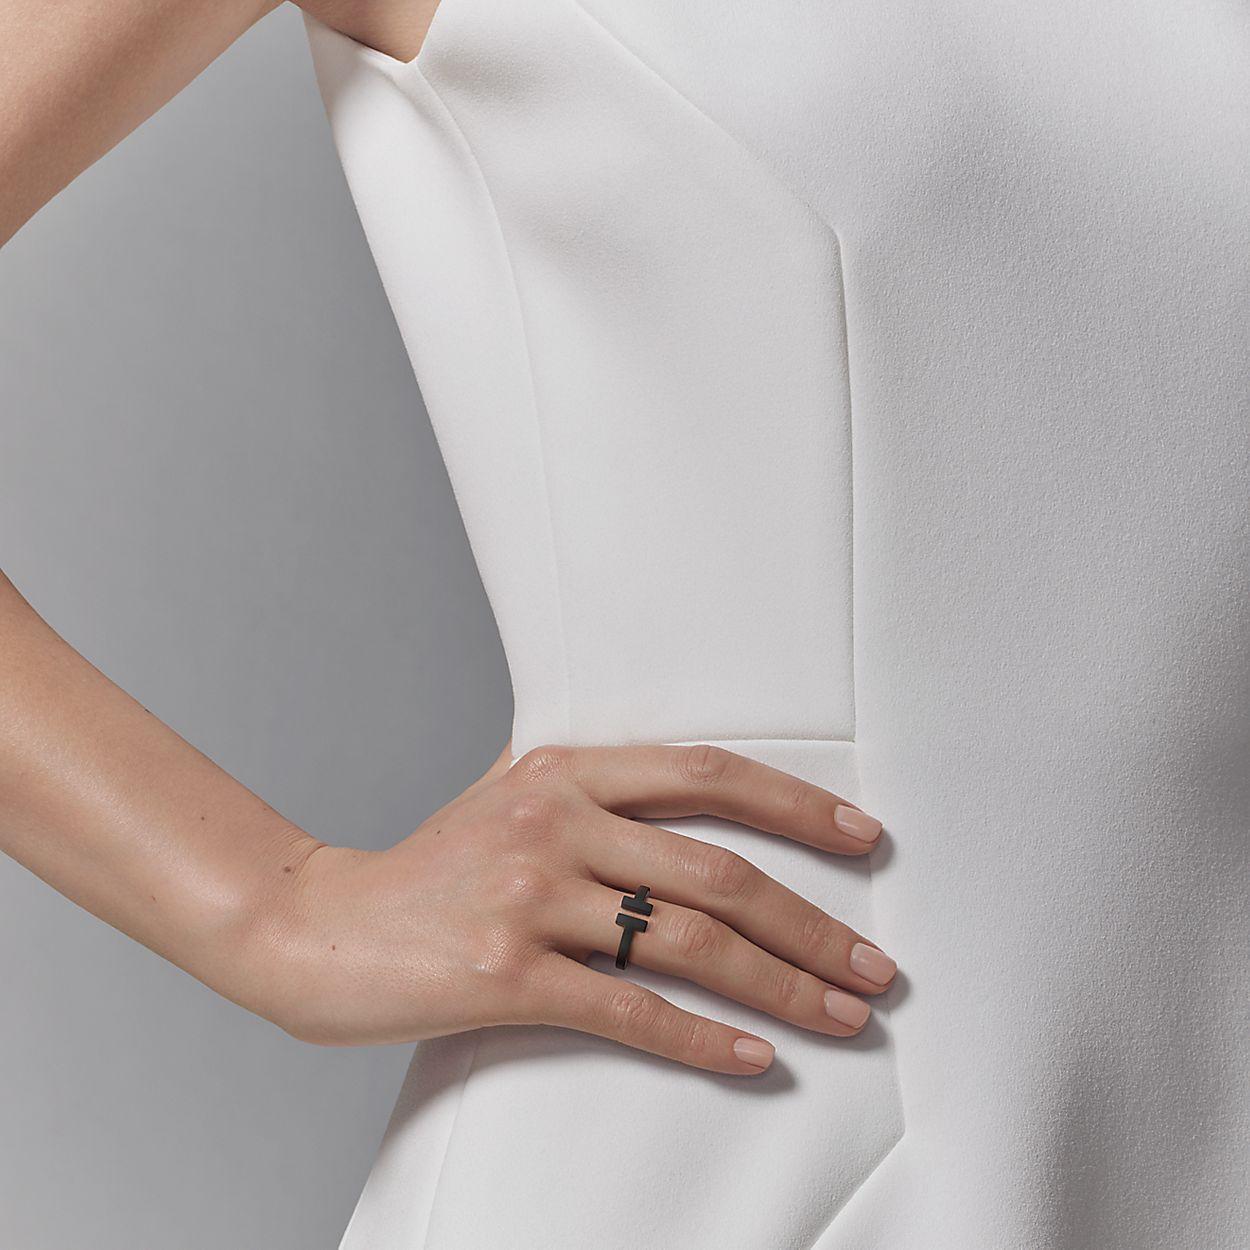 b7ea6c8205 Tiffany T square ring in black-coated steel.   Tiffany & Co.